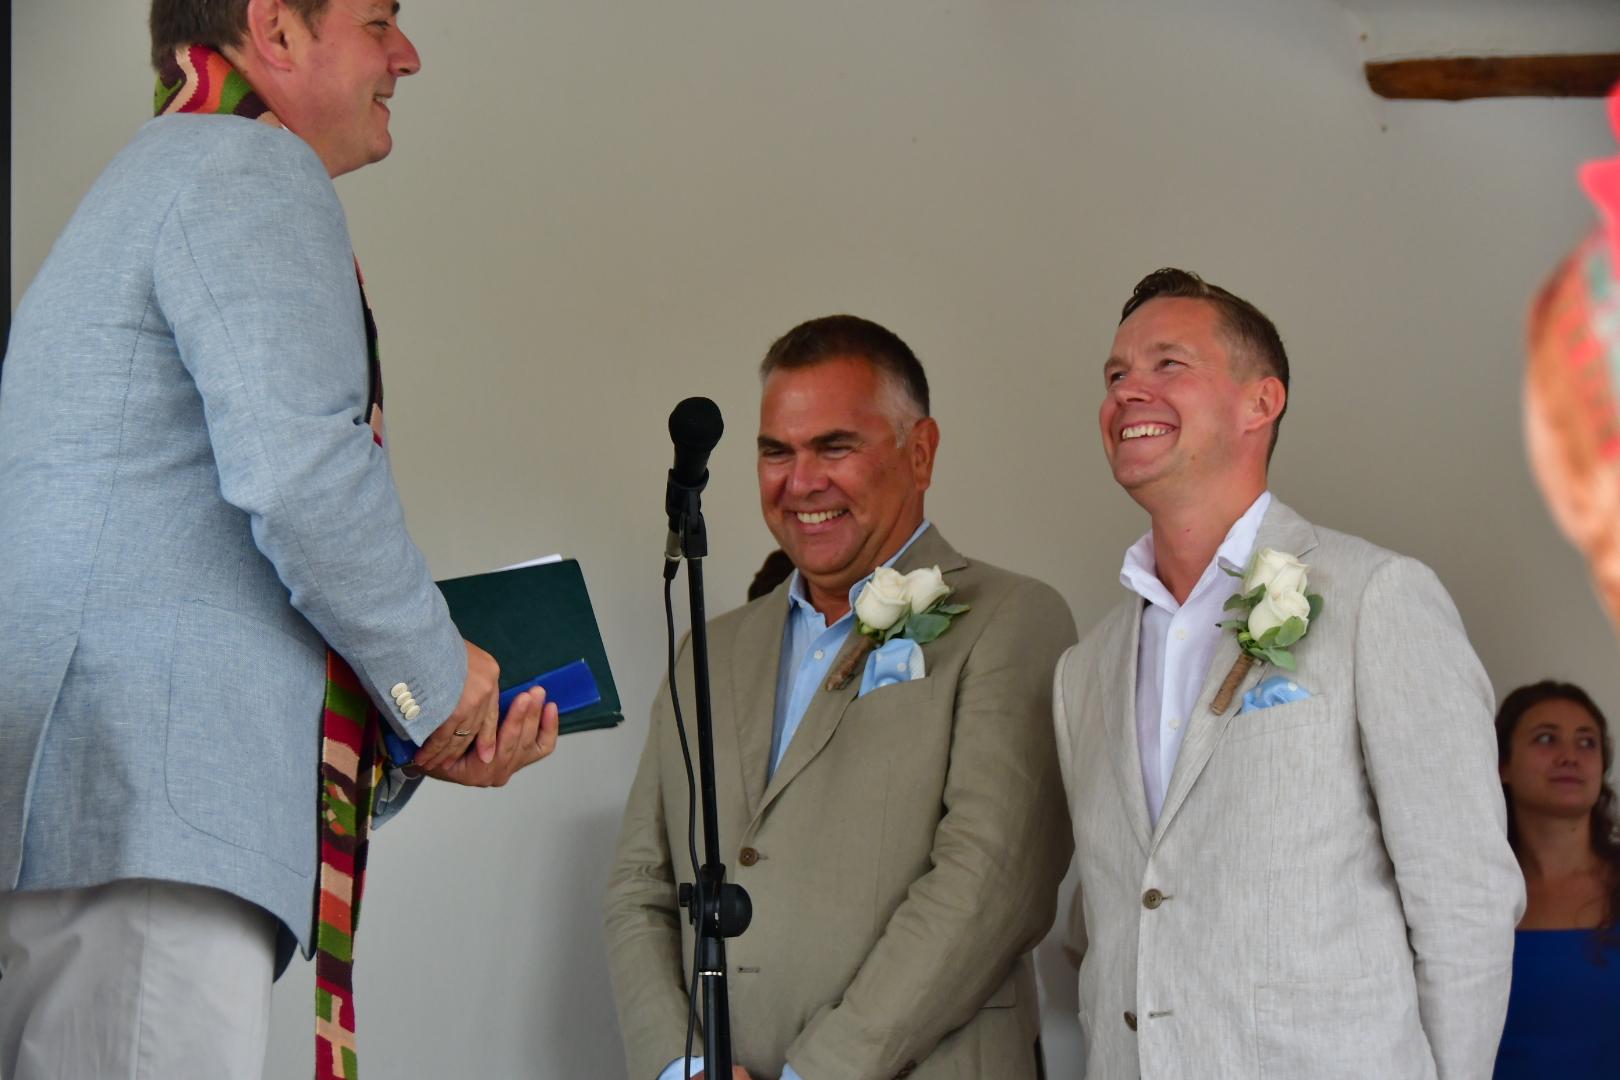 Watter Wedding.JPG